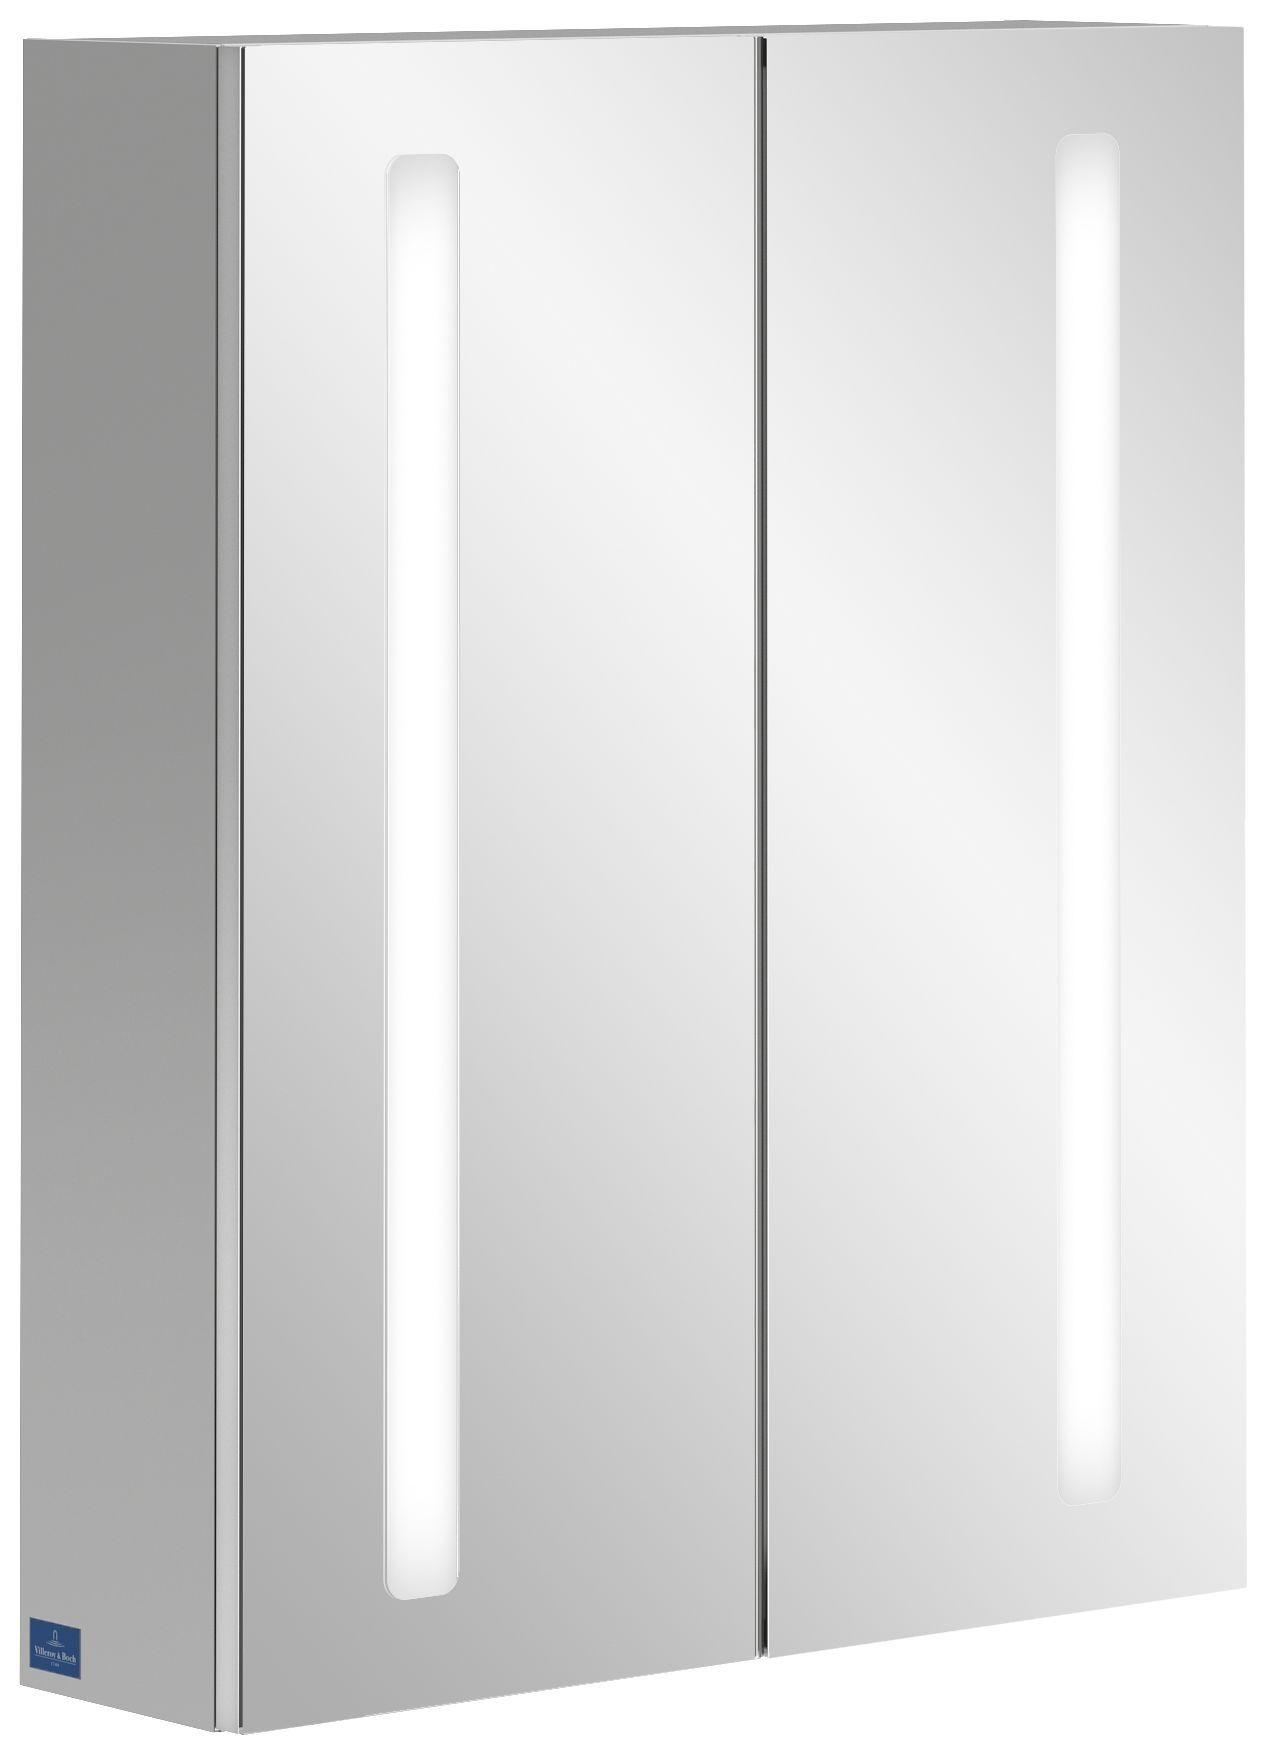 Villeroy & Boch My View 14 Spiegelschrank mit LED-Beleuchtung B: 60 cm A4206000